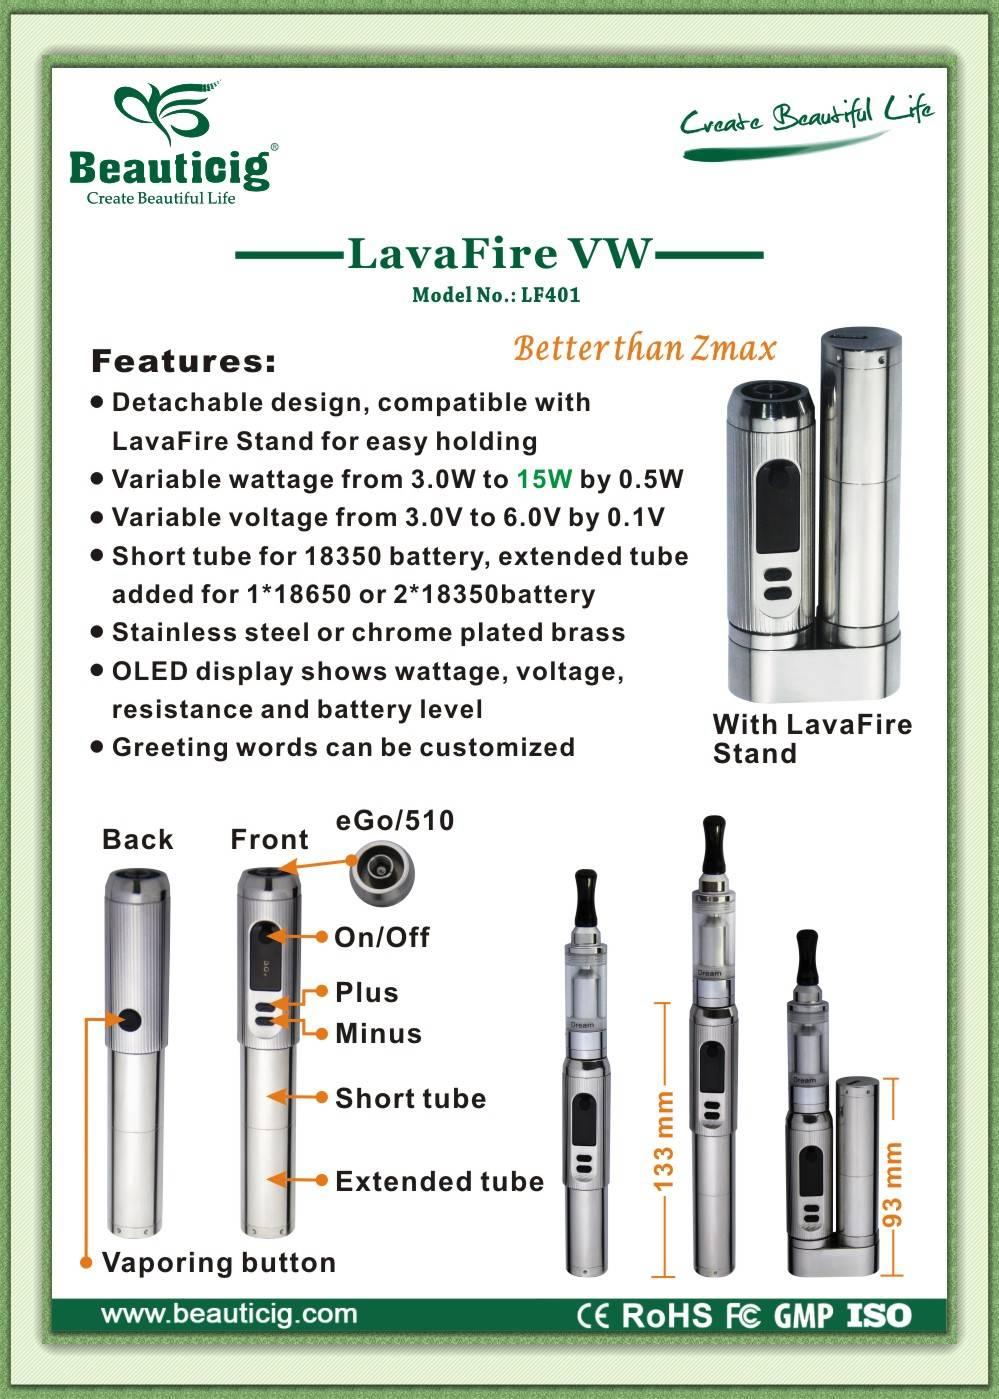 Lavafire VW